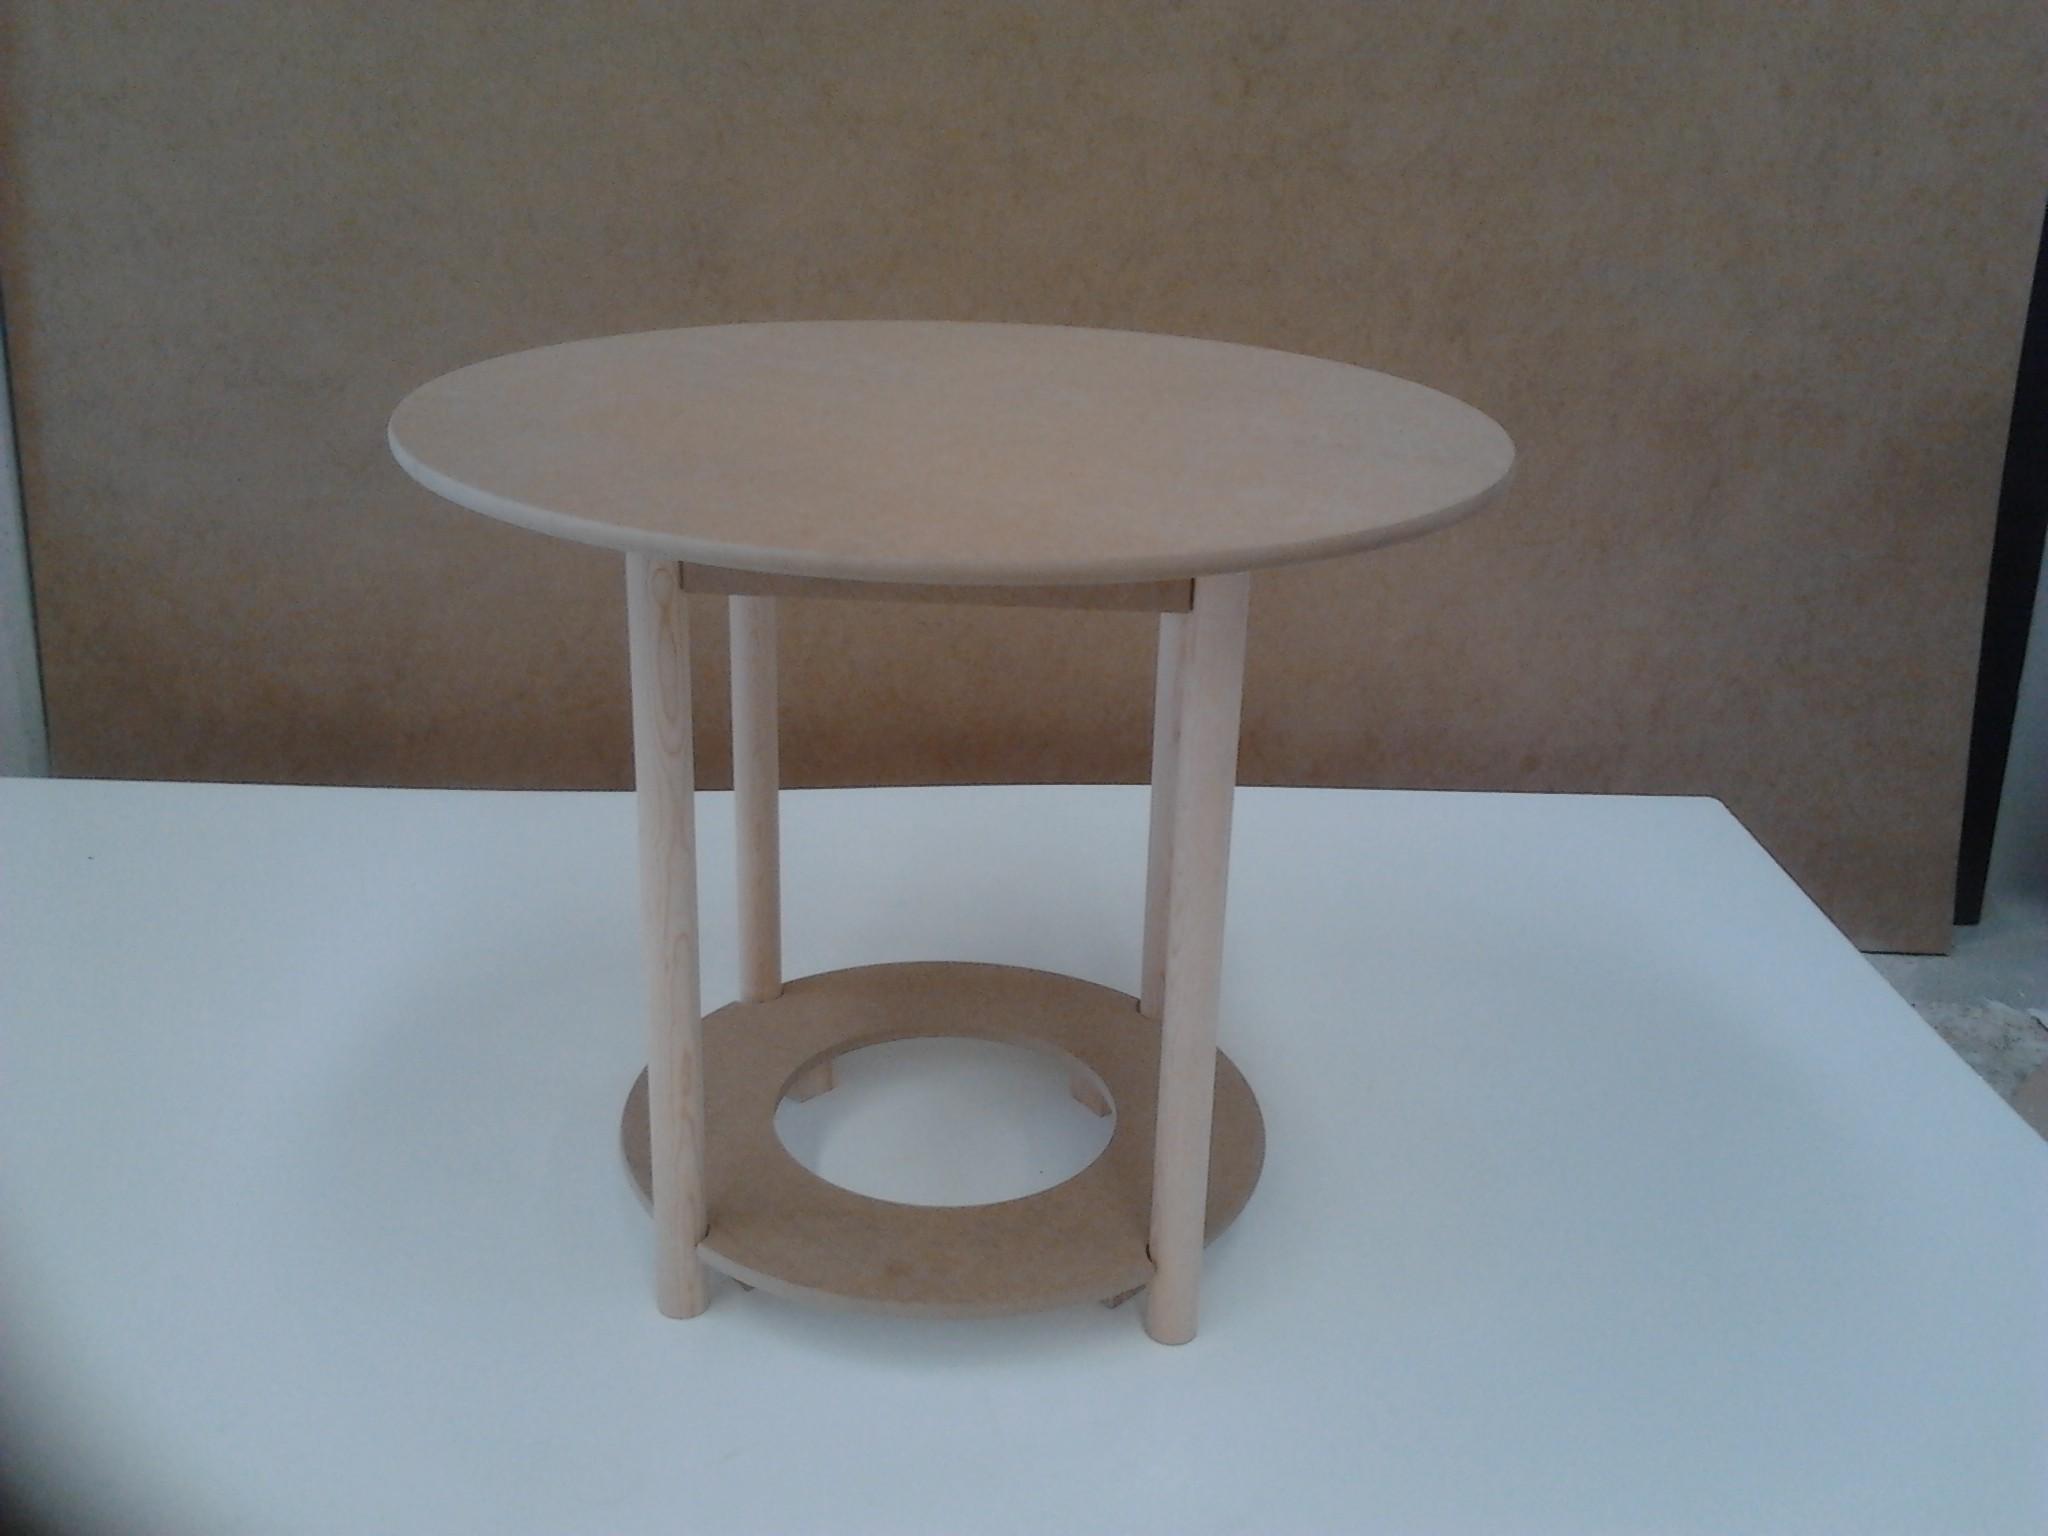 Foto mesa camilla redonda 80 cms dm foto 531072 - Mesa camilla redonda ...